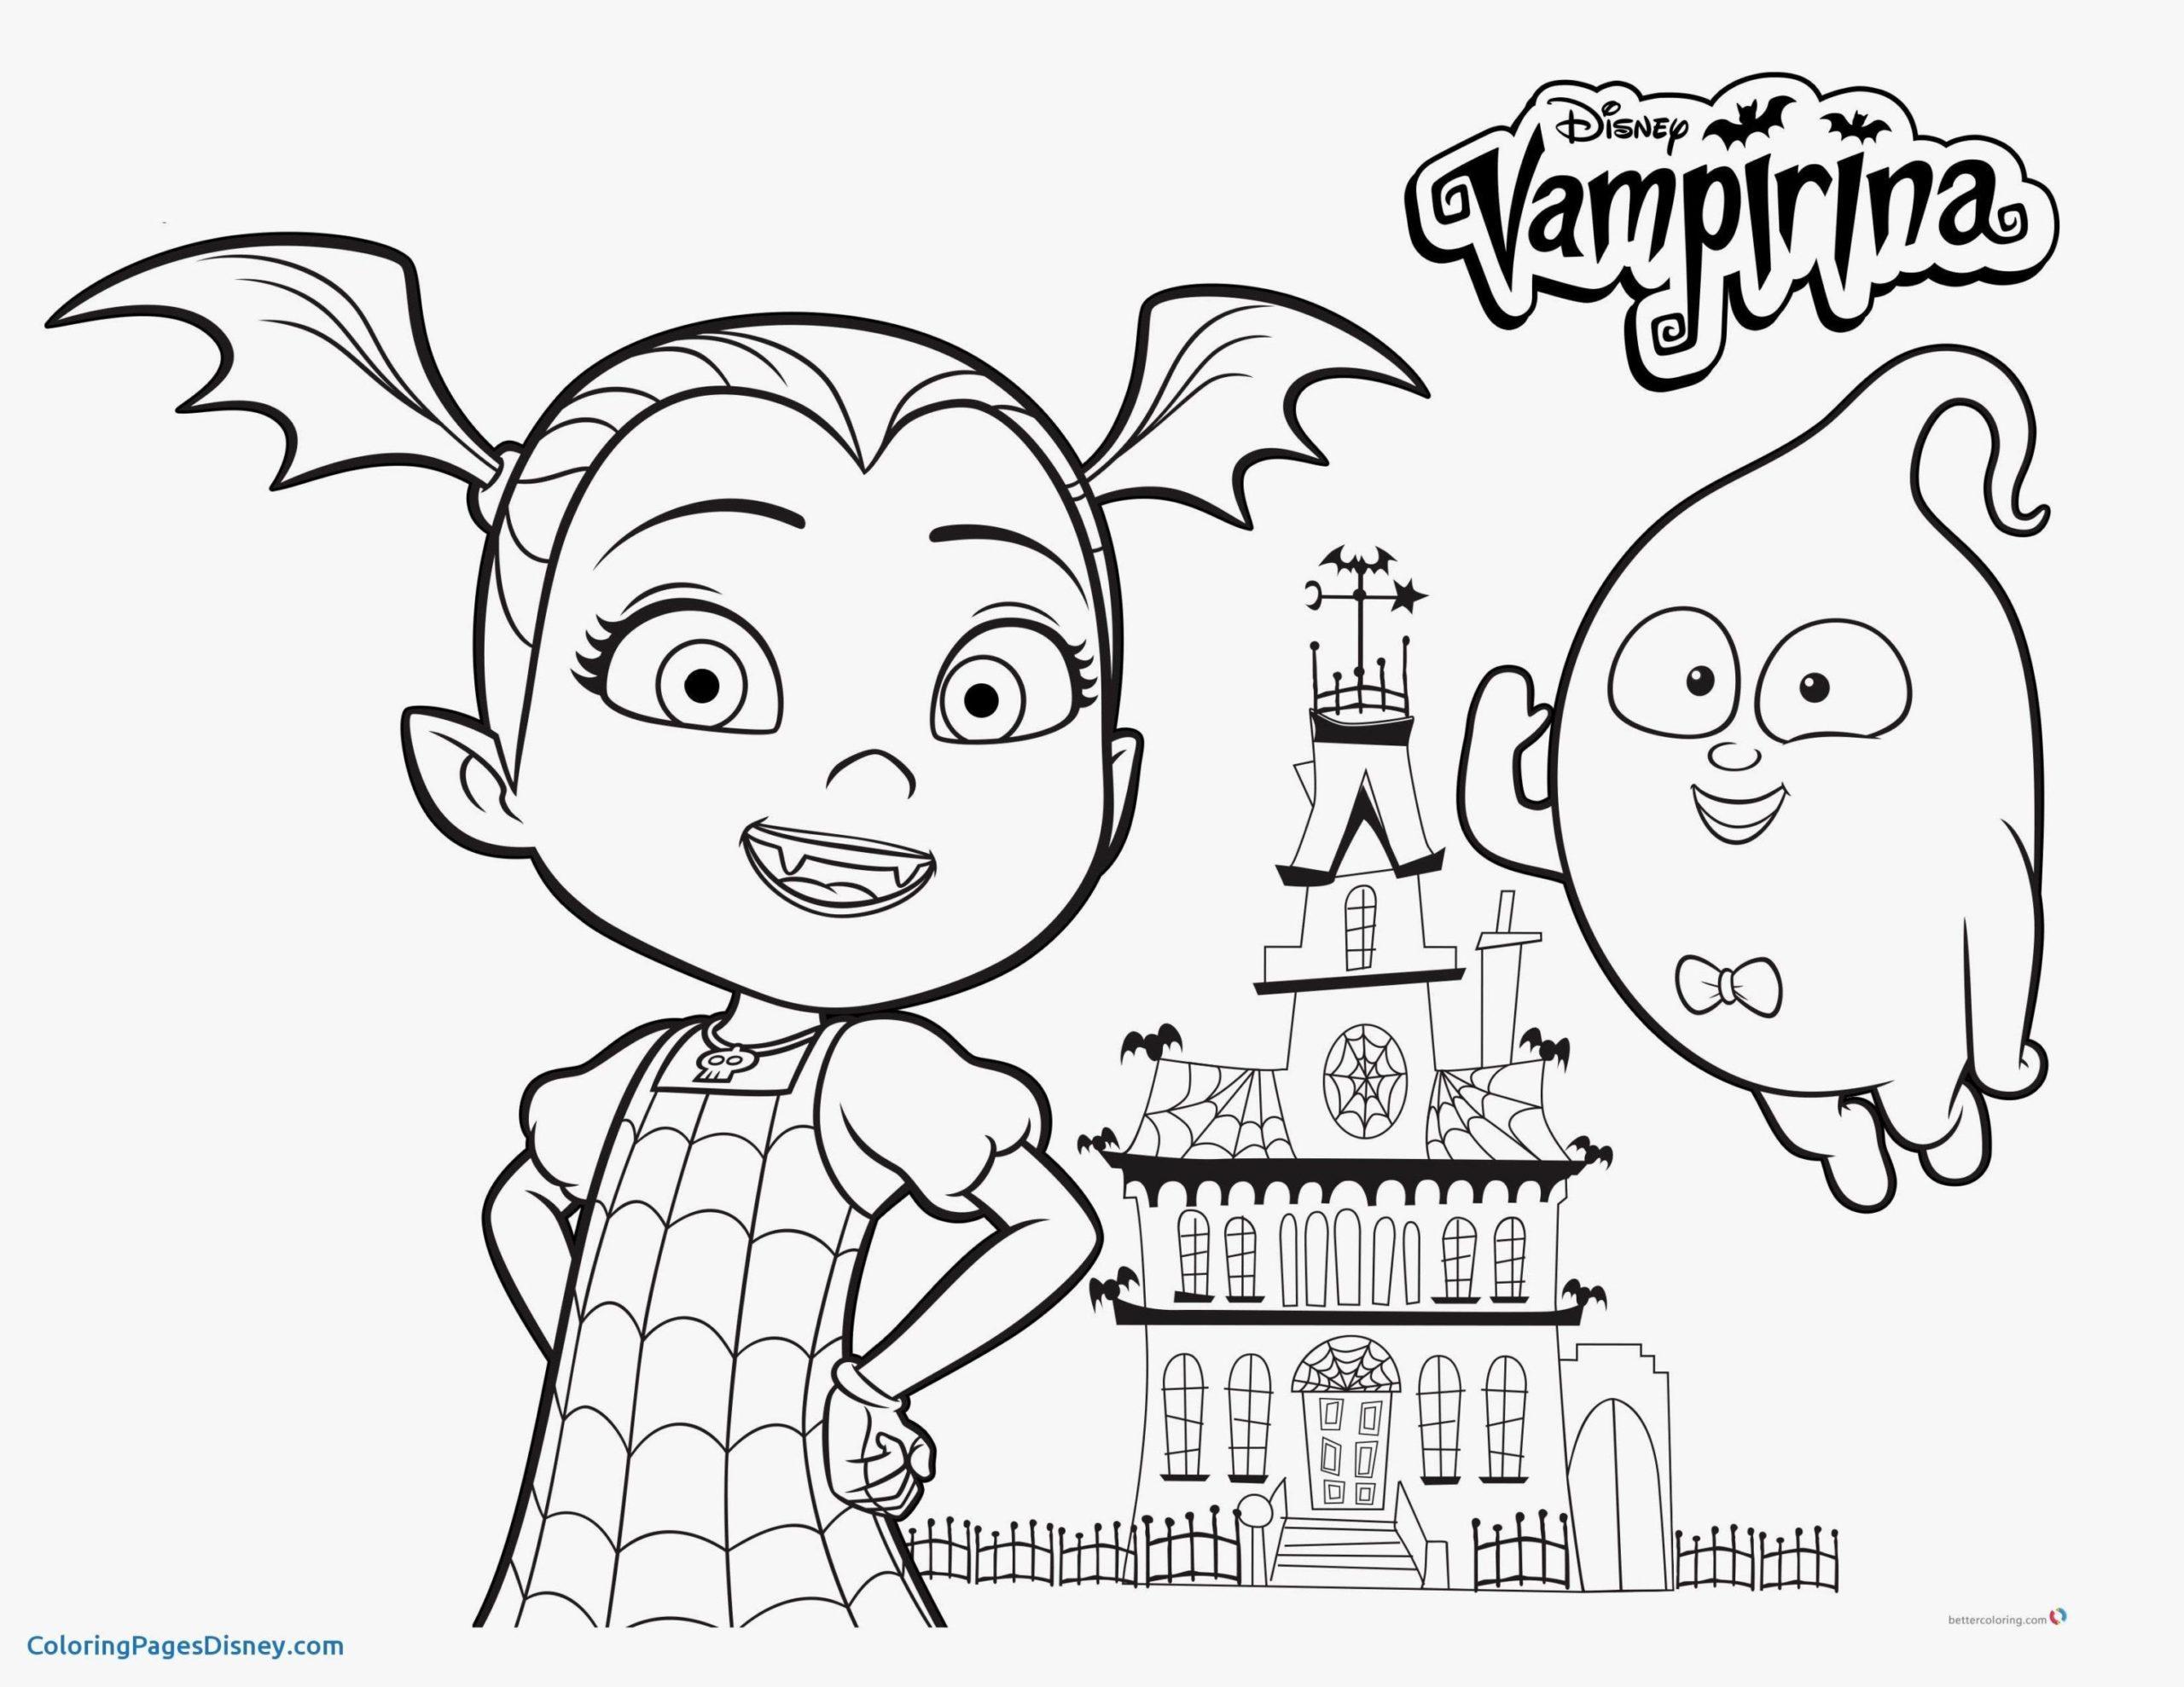 Coloring Pages Colouring Vampirina Pusat Hobi Coloring Book Coloring Home